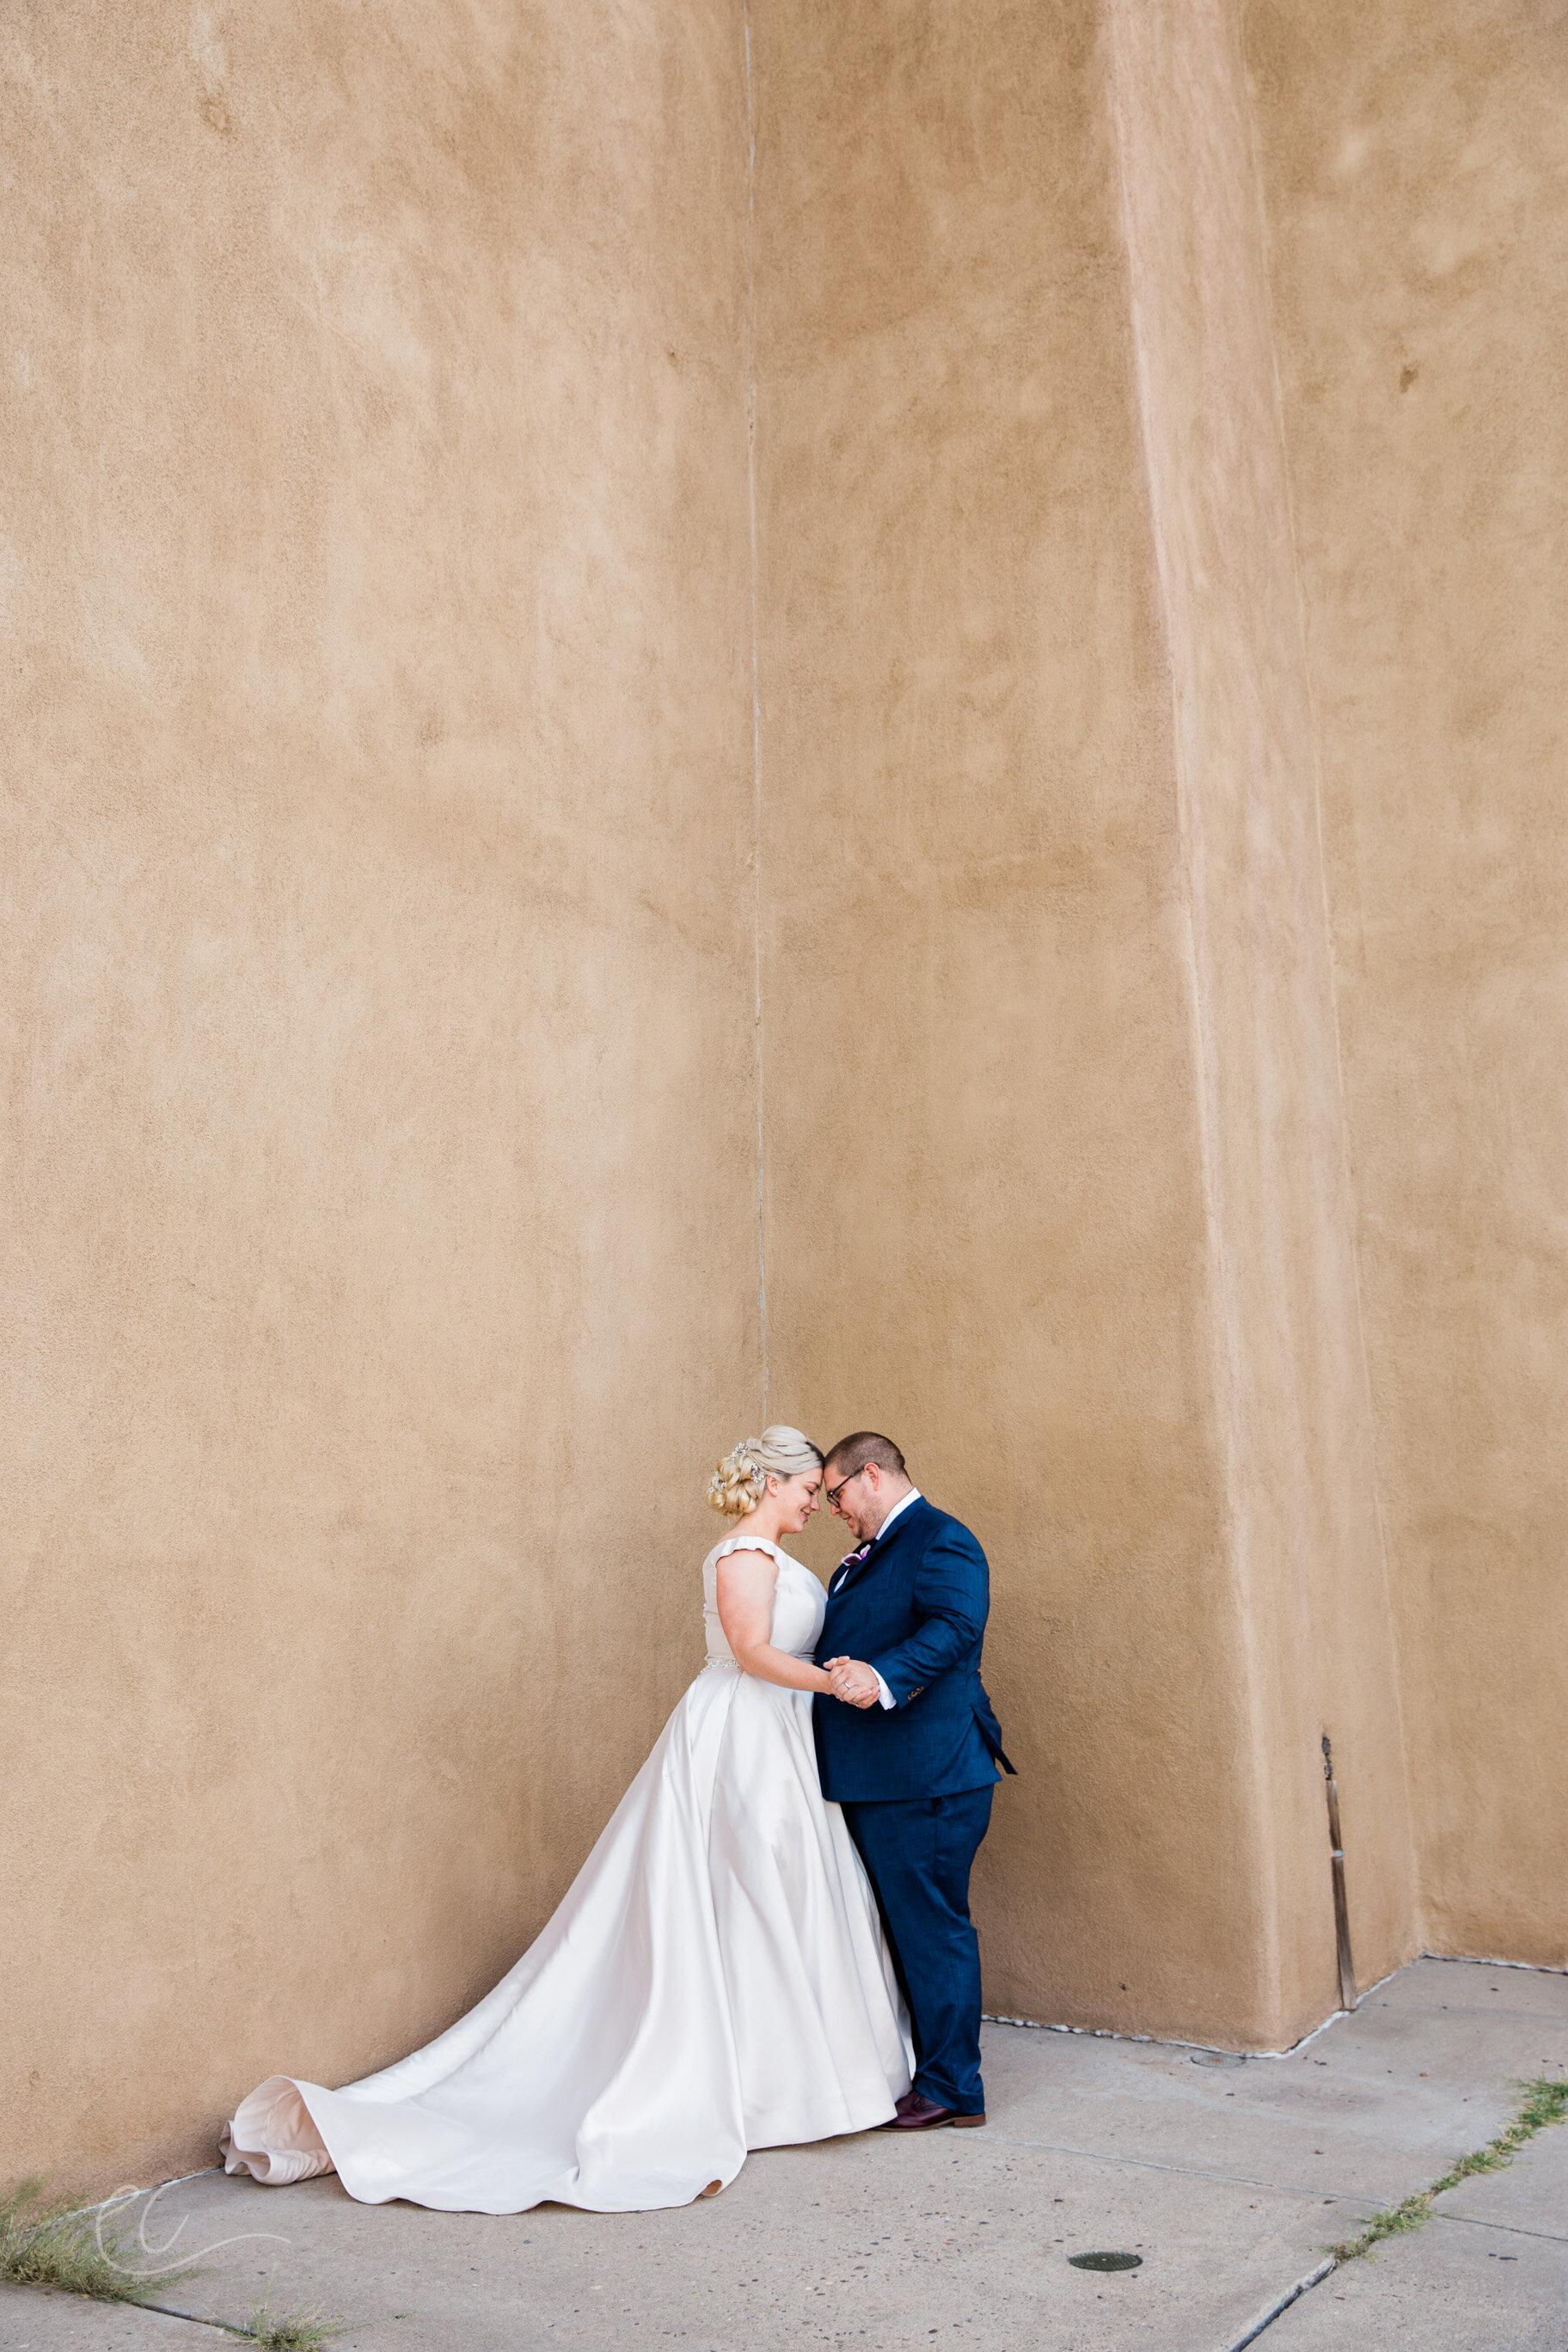 Santafe_wedding_photography_kellyzac-54.jpg